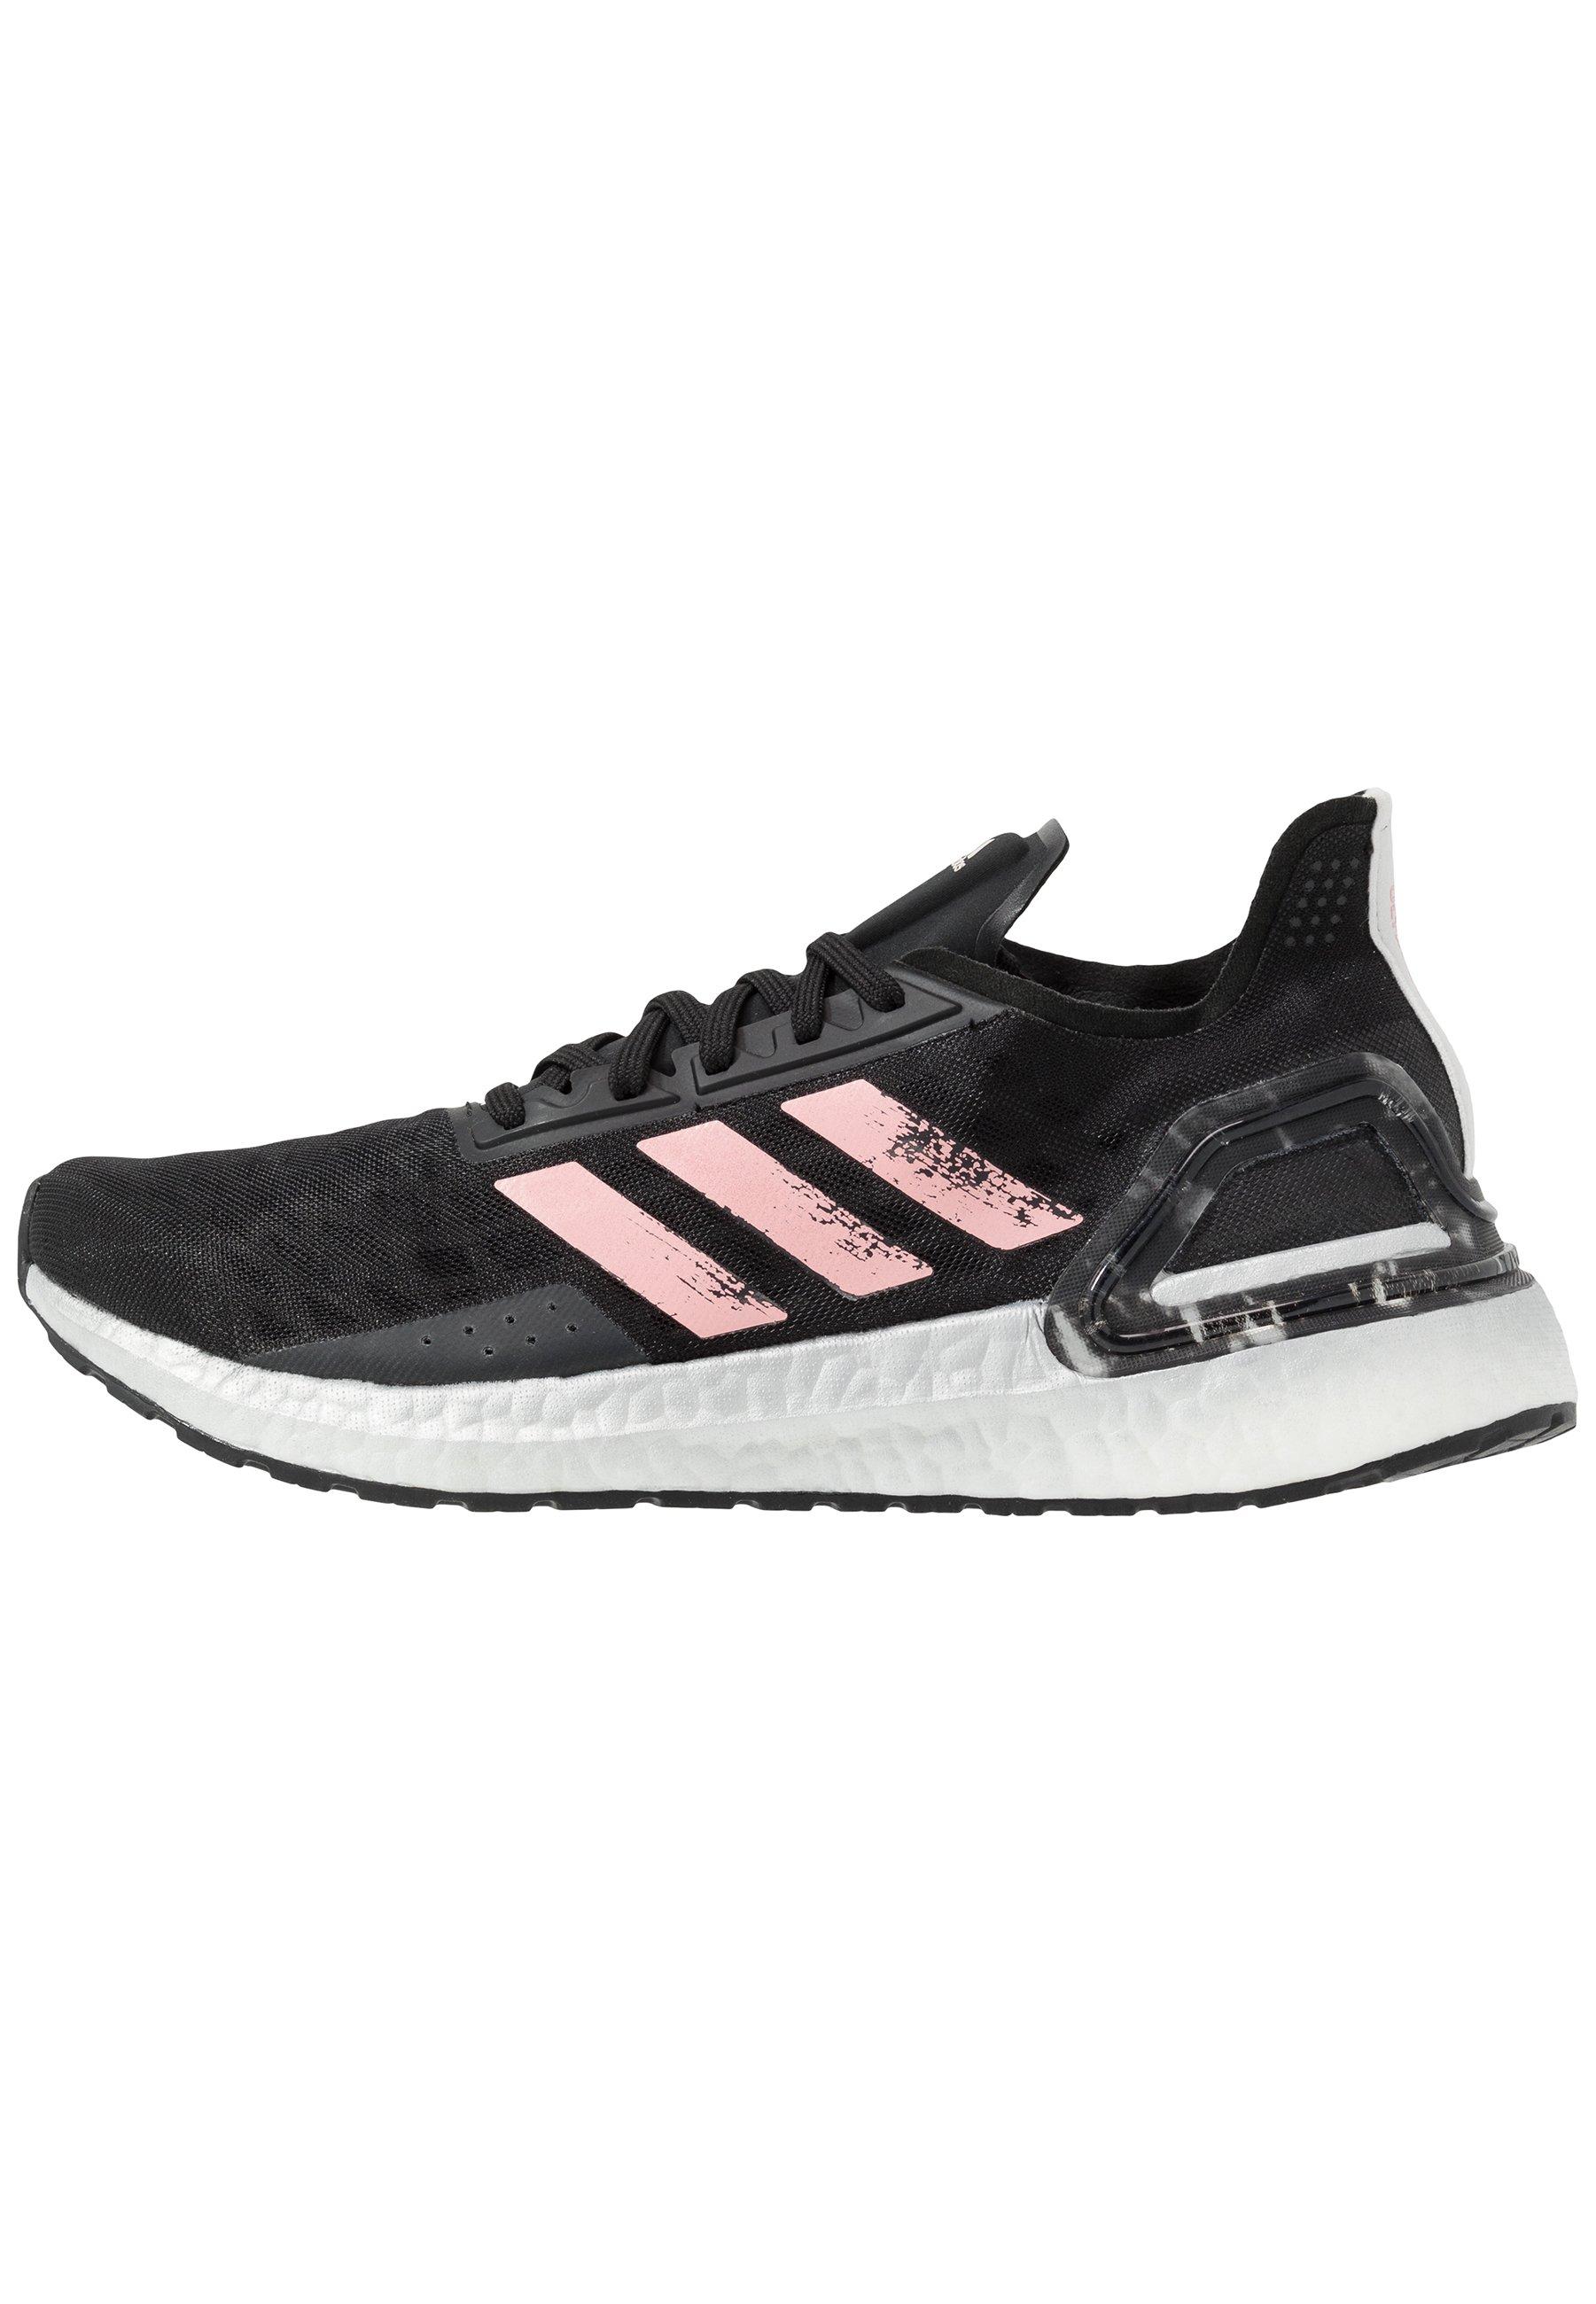 ULTRABOOST PB Neutral running shoes core blackglow pinkfootwear white